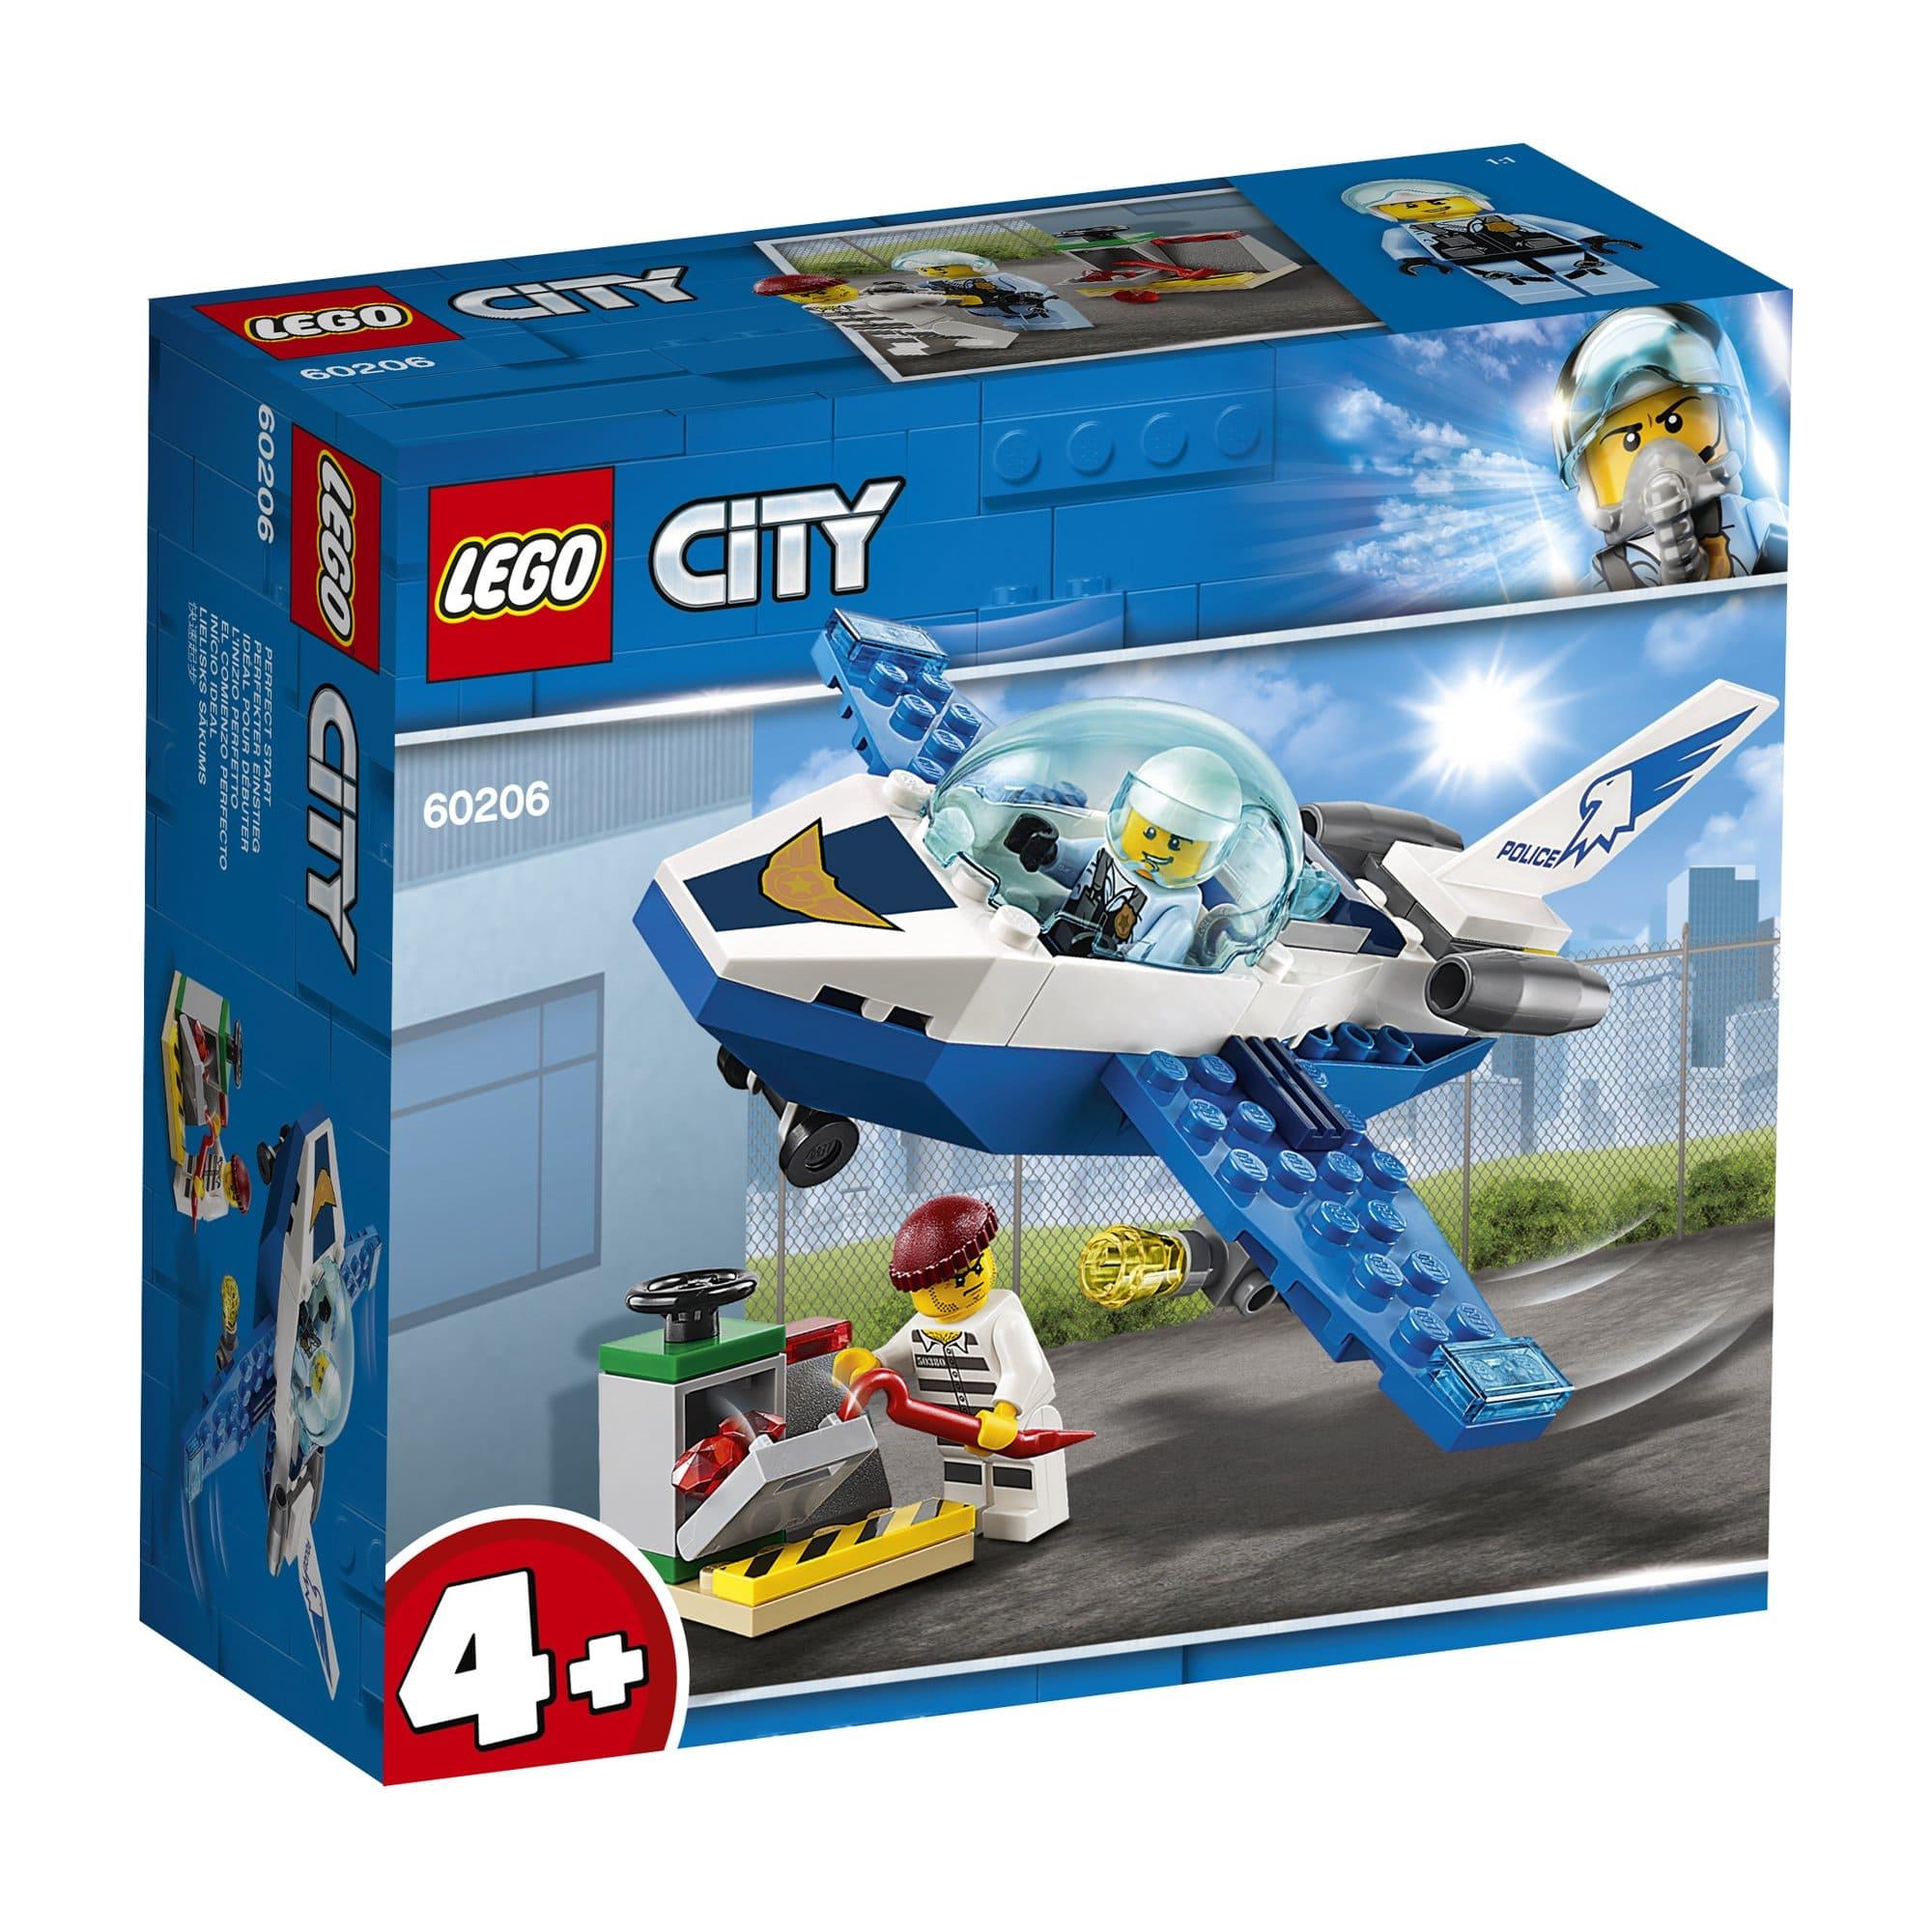 LEGO 樂高積木 City Police 60206 航警巡邏機